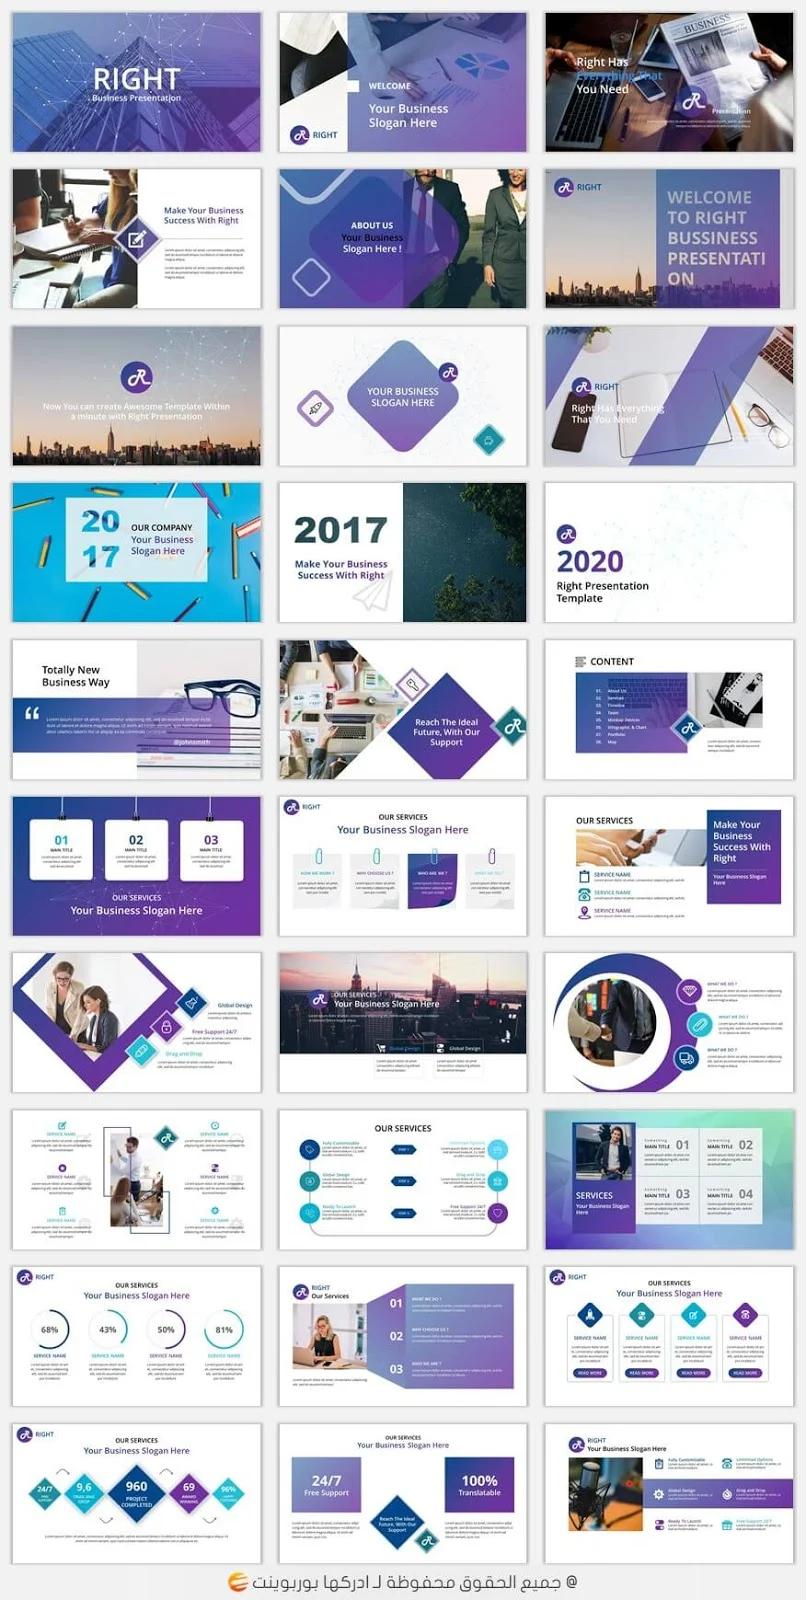 تحميل قالب بوربوينت احترافي جاهز للتعديل Ppt ادركها بوربوينت Powerpoint Templates Brochure Design Powerpoint